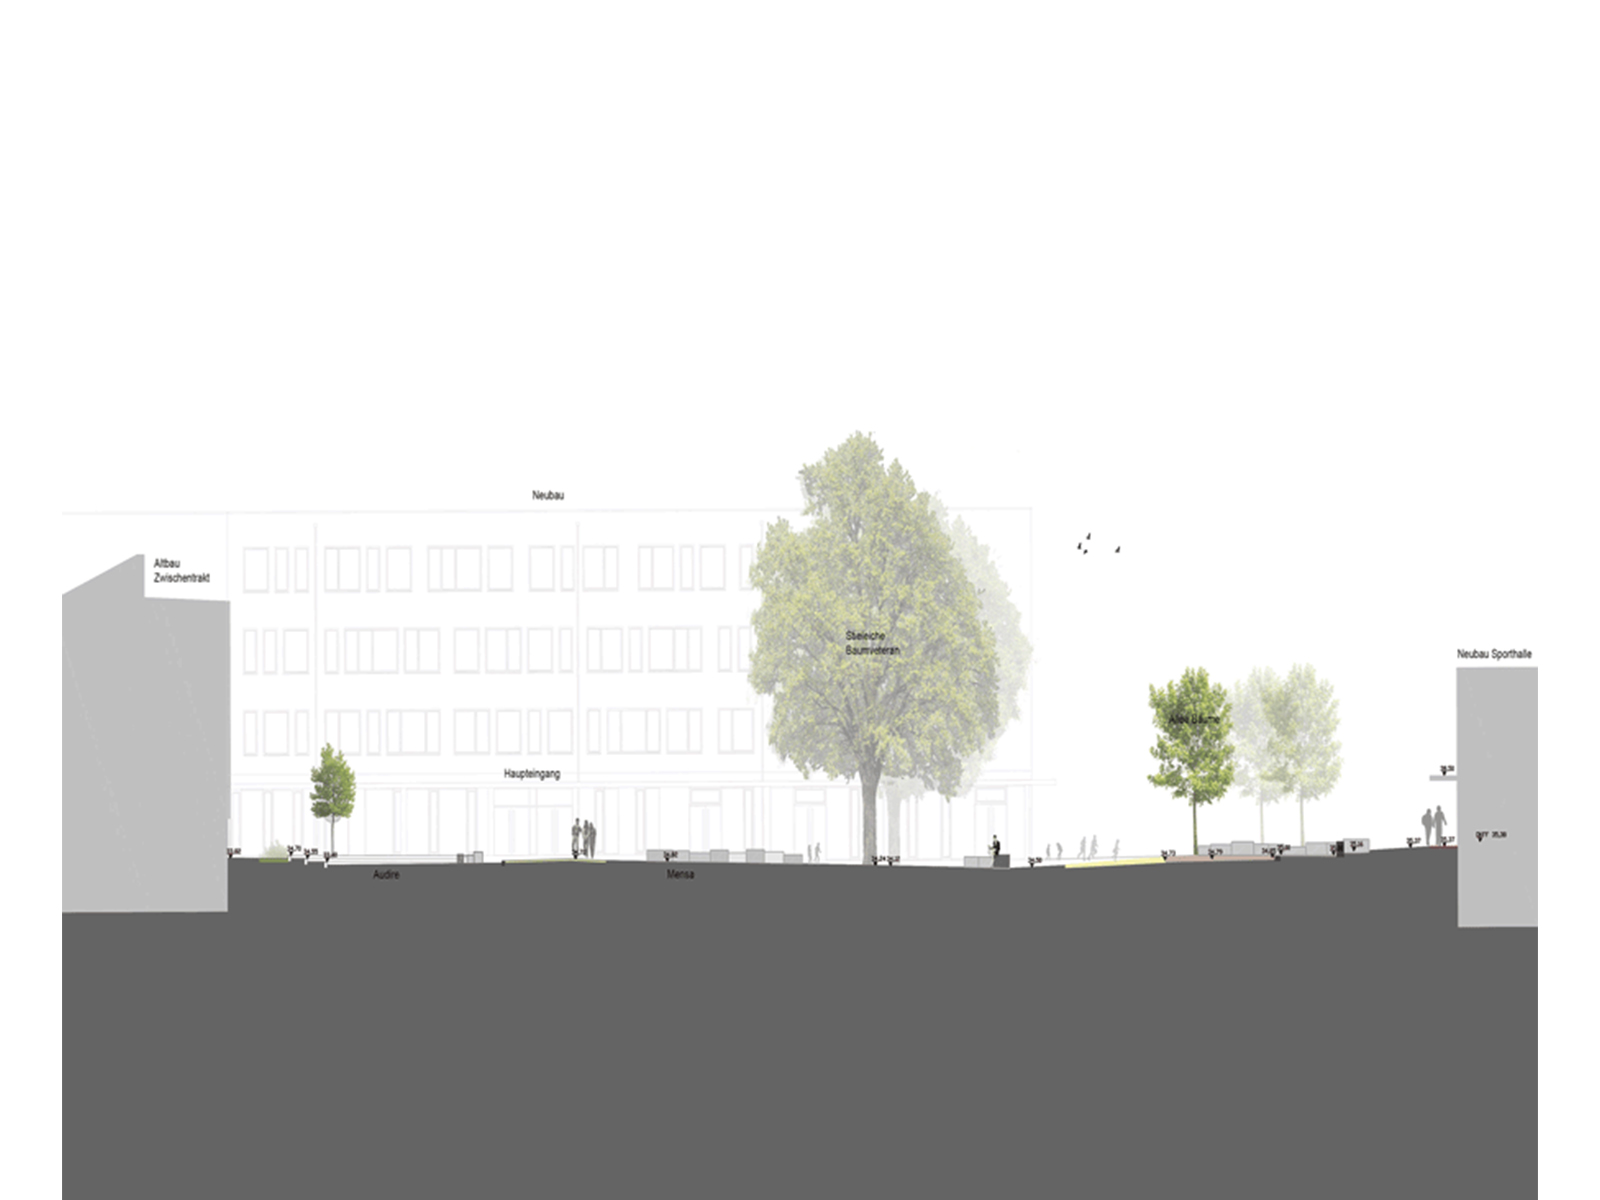 Schnitt-Entwurf-Kita-Schulhöfe-Berlin-Landschaftarchitekten-Armbruster